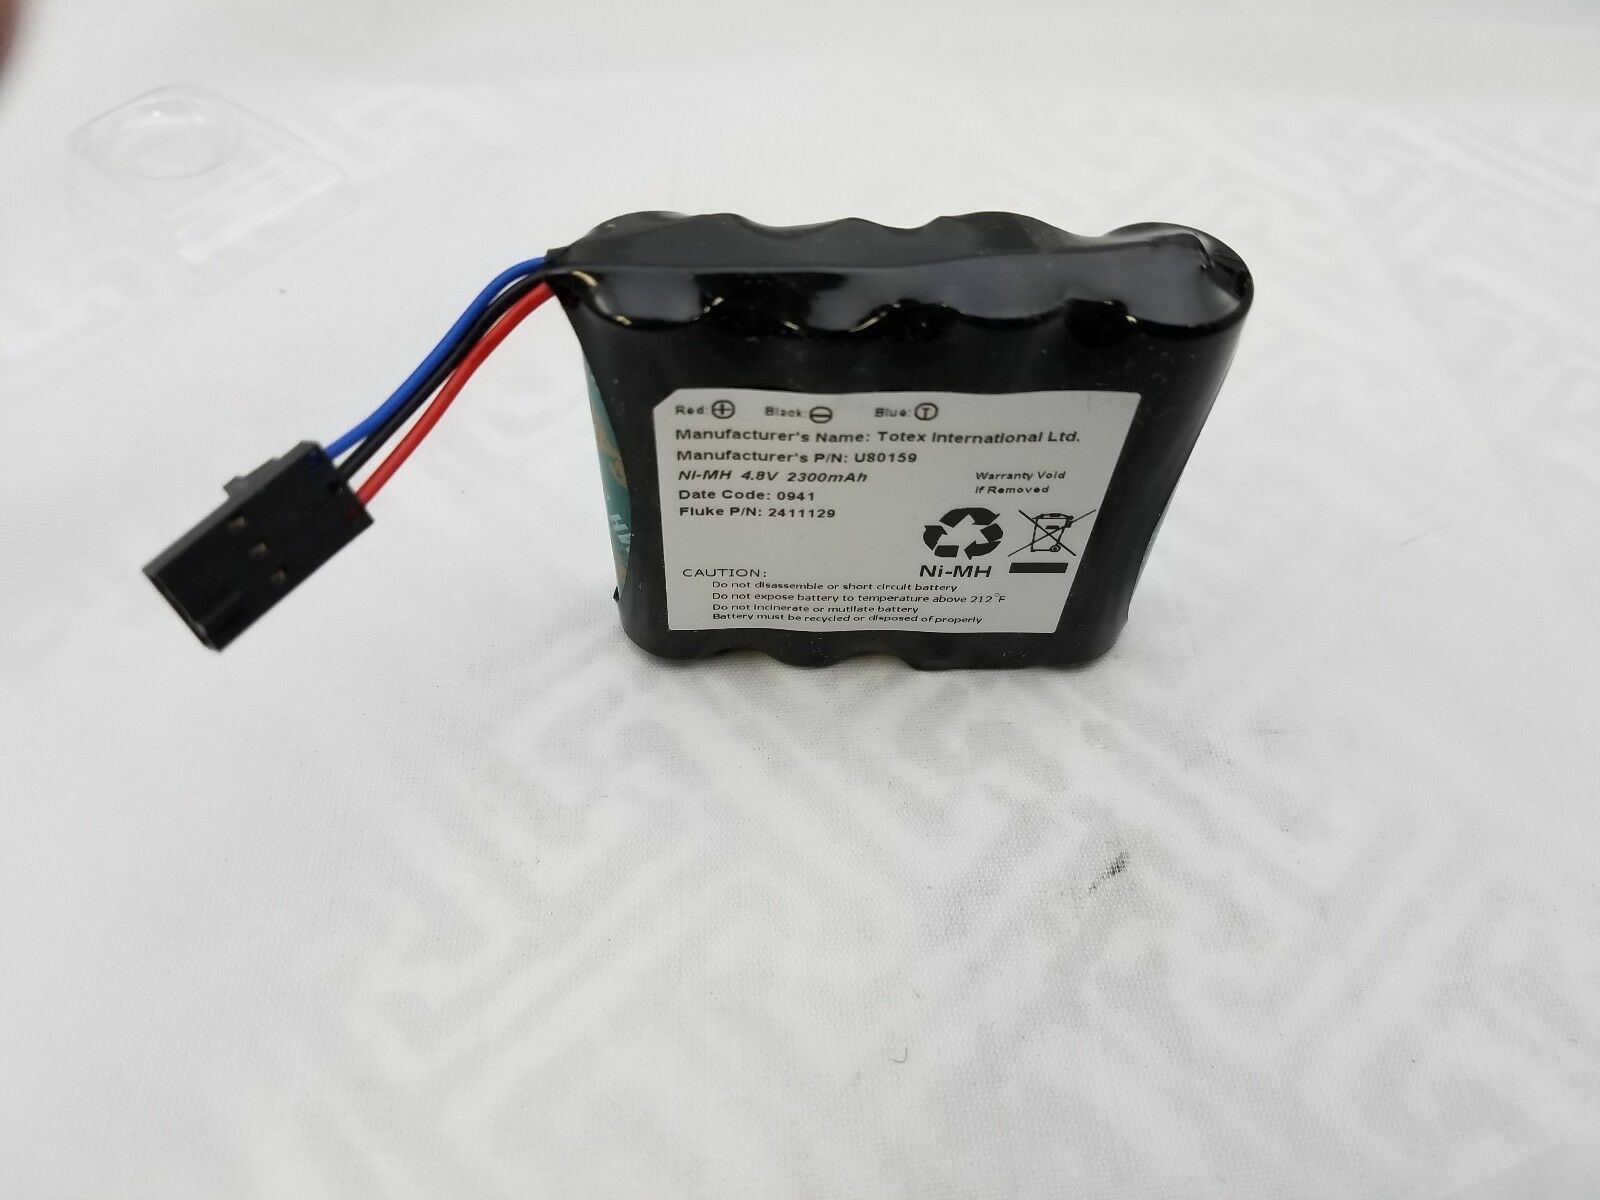 Ladegerät für Akkupack 4,8-9,6V+RC Pack 9,6V//2300mAh AA L4x2NiMH+Tamiya Stecker